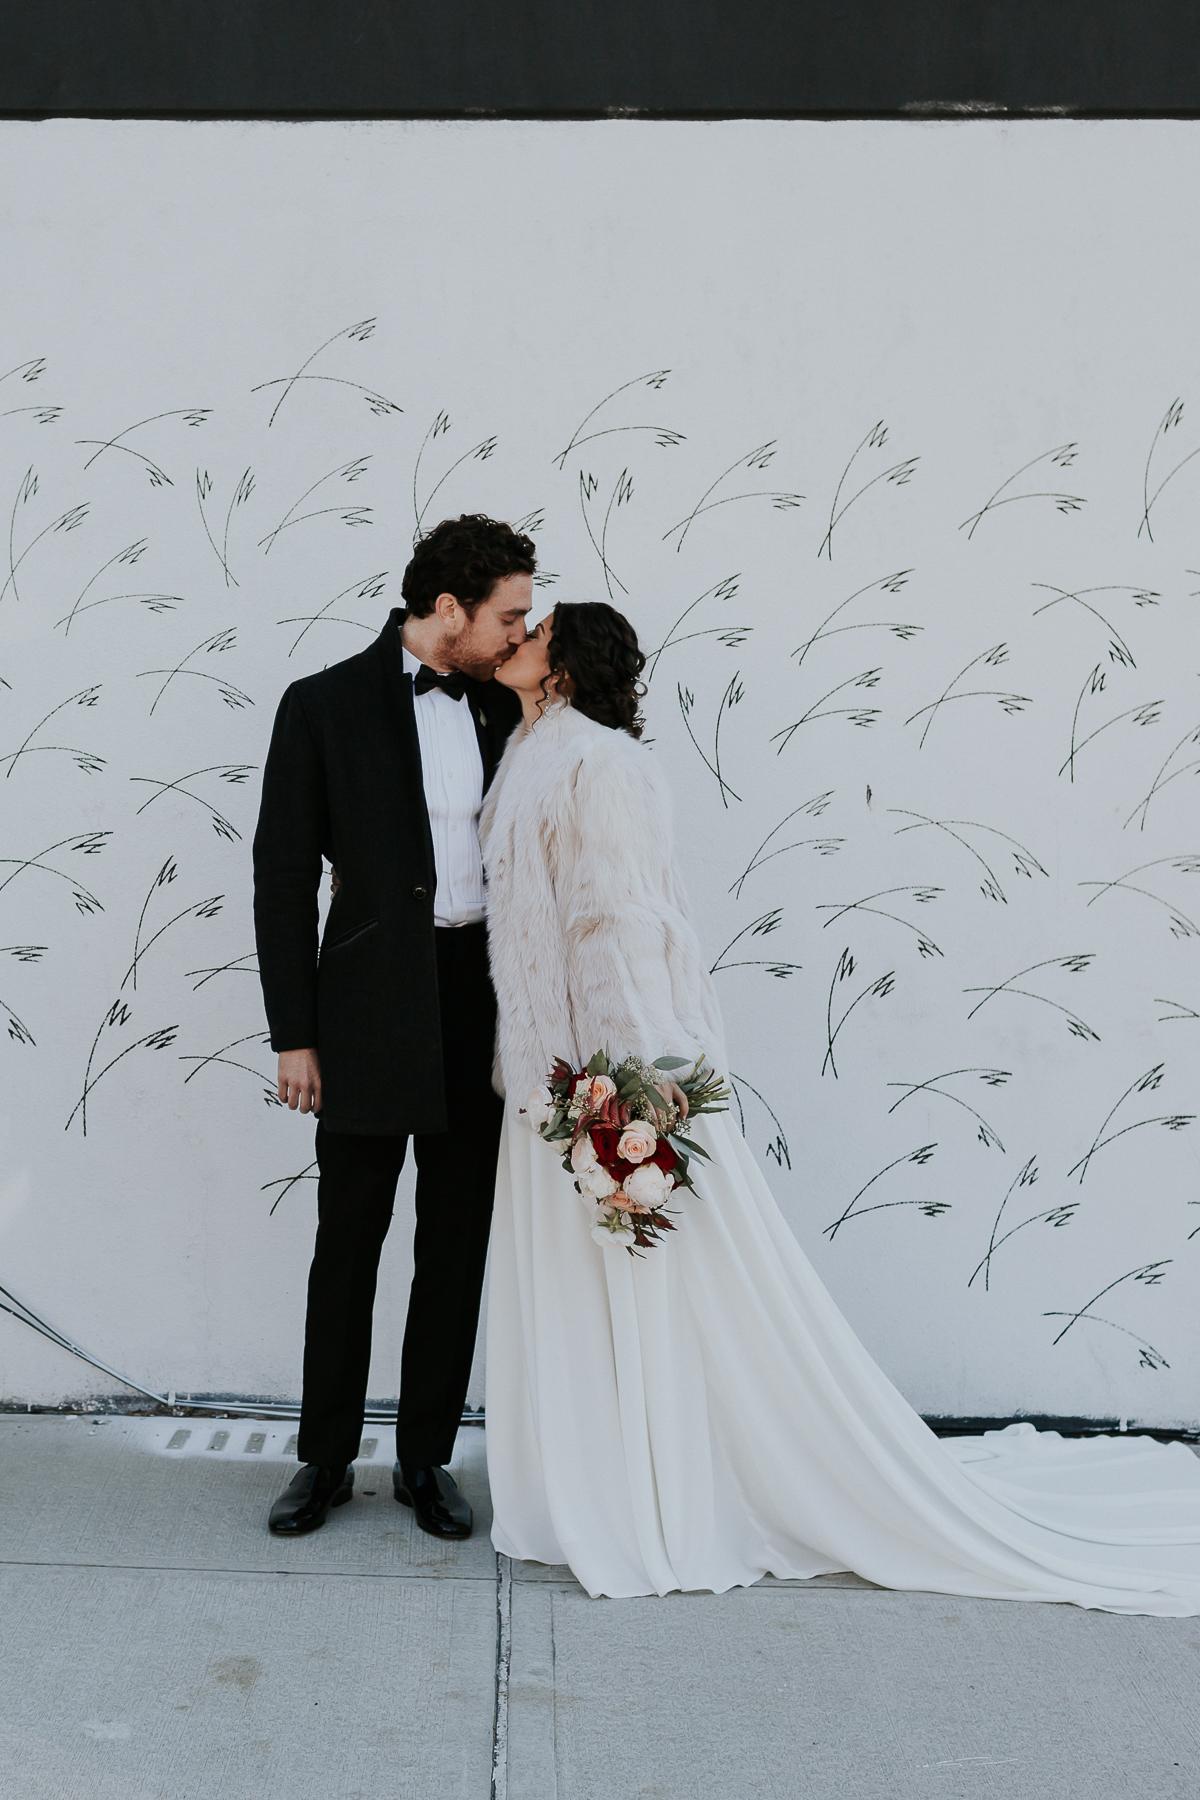 Humboldt-&-Jackson-Restaurant-Intimate-Brooklyn-Documentary-Wedding-Photographer-23.jpg